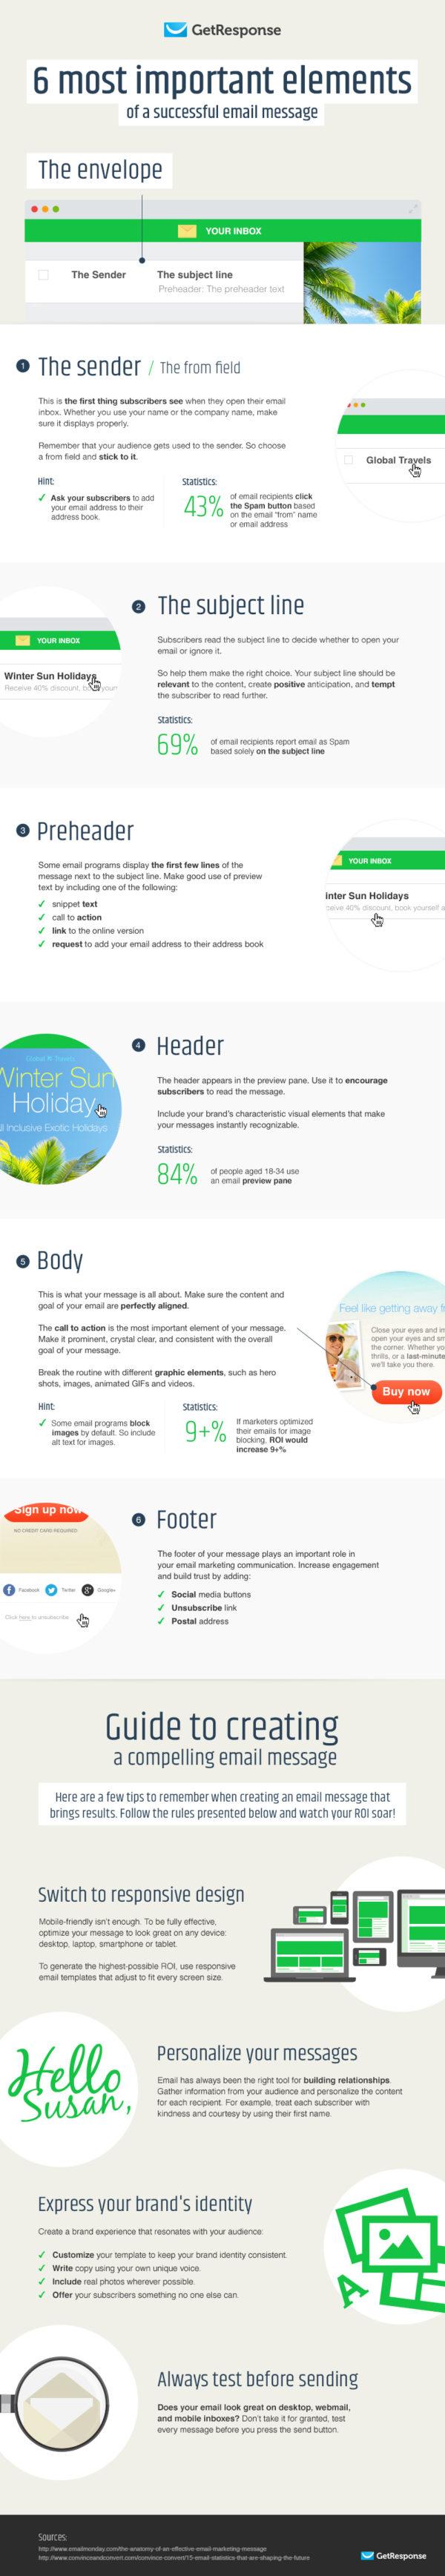 infographic_6elements